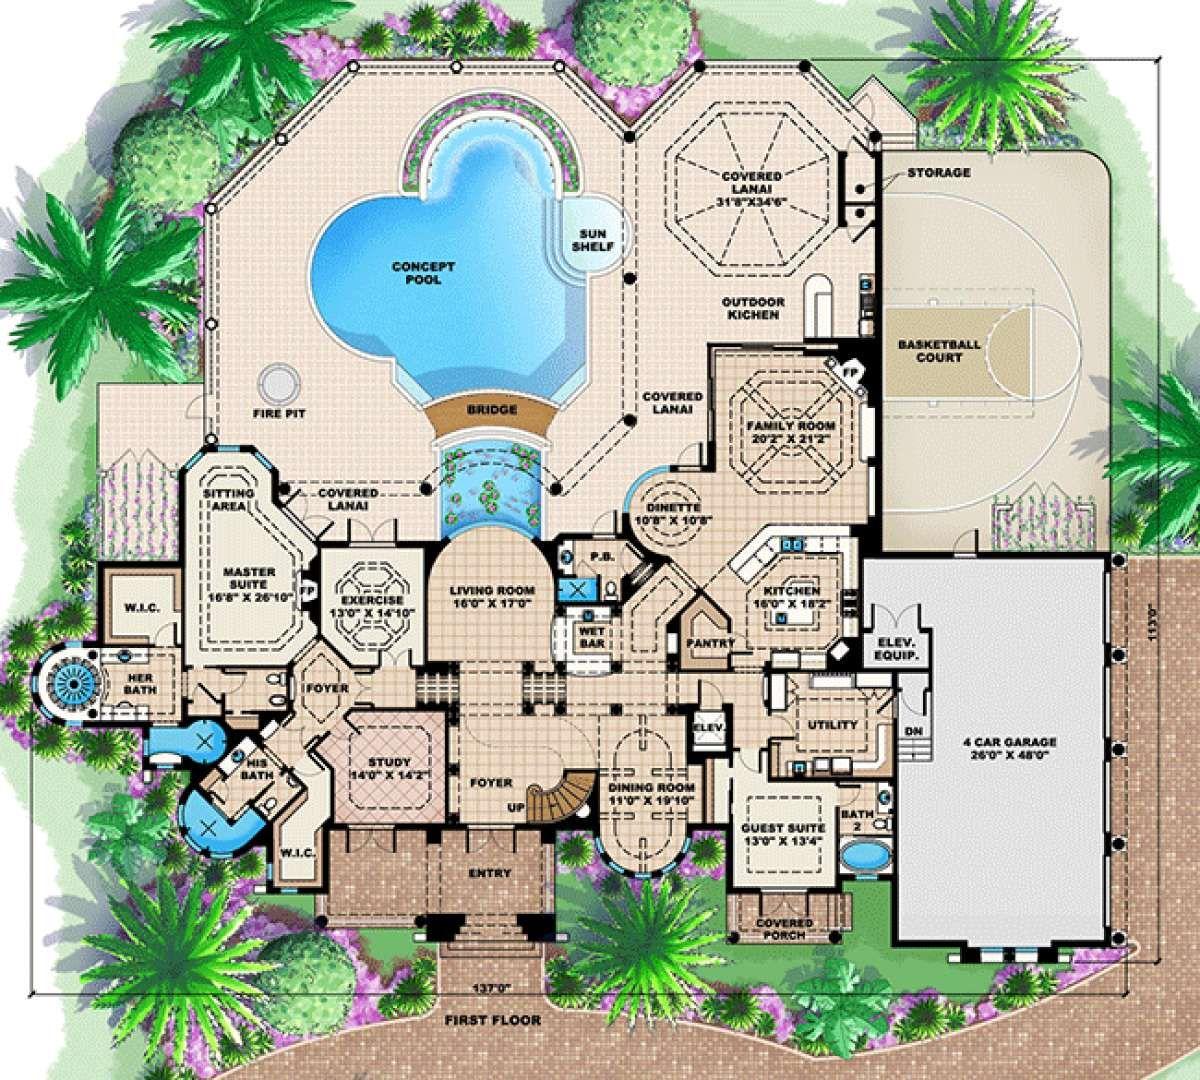 House Plan 1018 00182 Florida Plan 6 295 Square Feet 4 5 Bedrooms 7 Bathrooms Mediterranean Style House Plans Florida House Plans House Plans